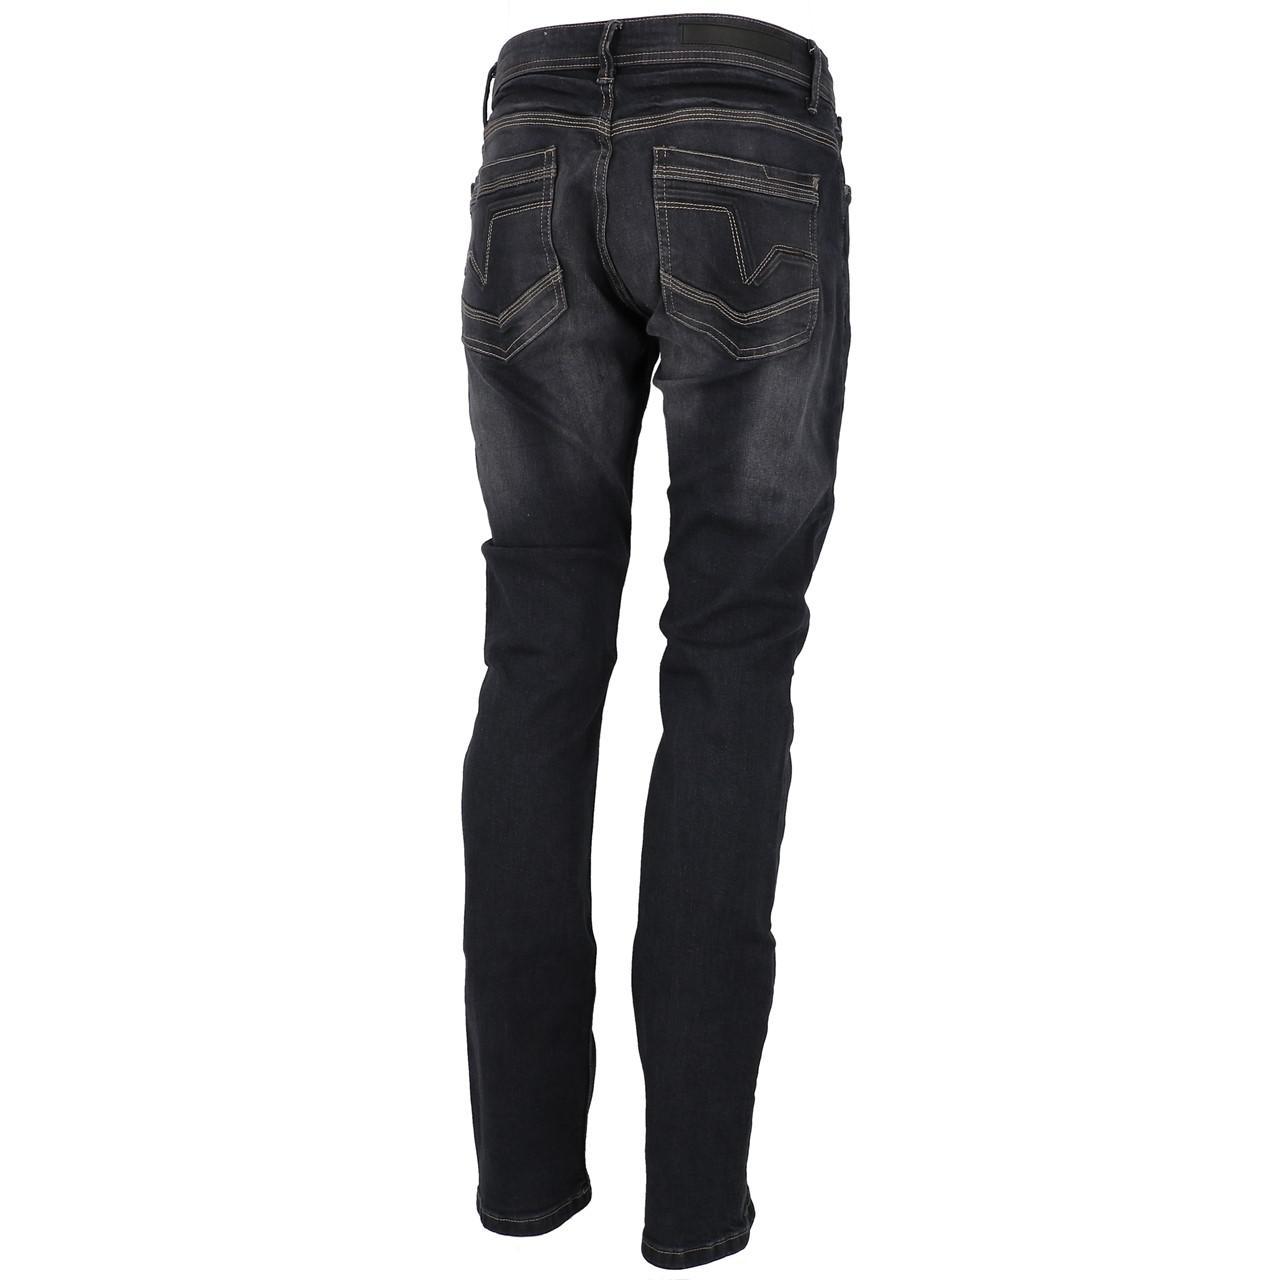 Jeans-Pants-RMS-26-Jeans-Grey-Blue-Regular-Blue-27122-New thumbnail 5